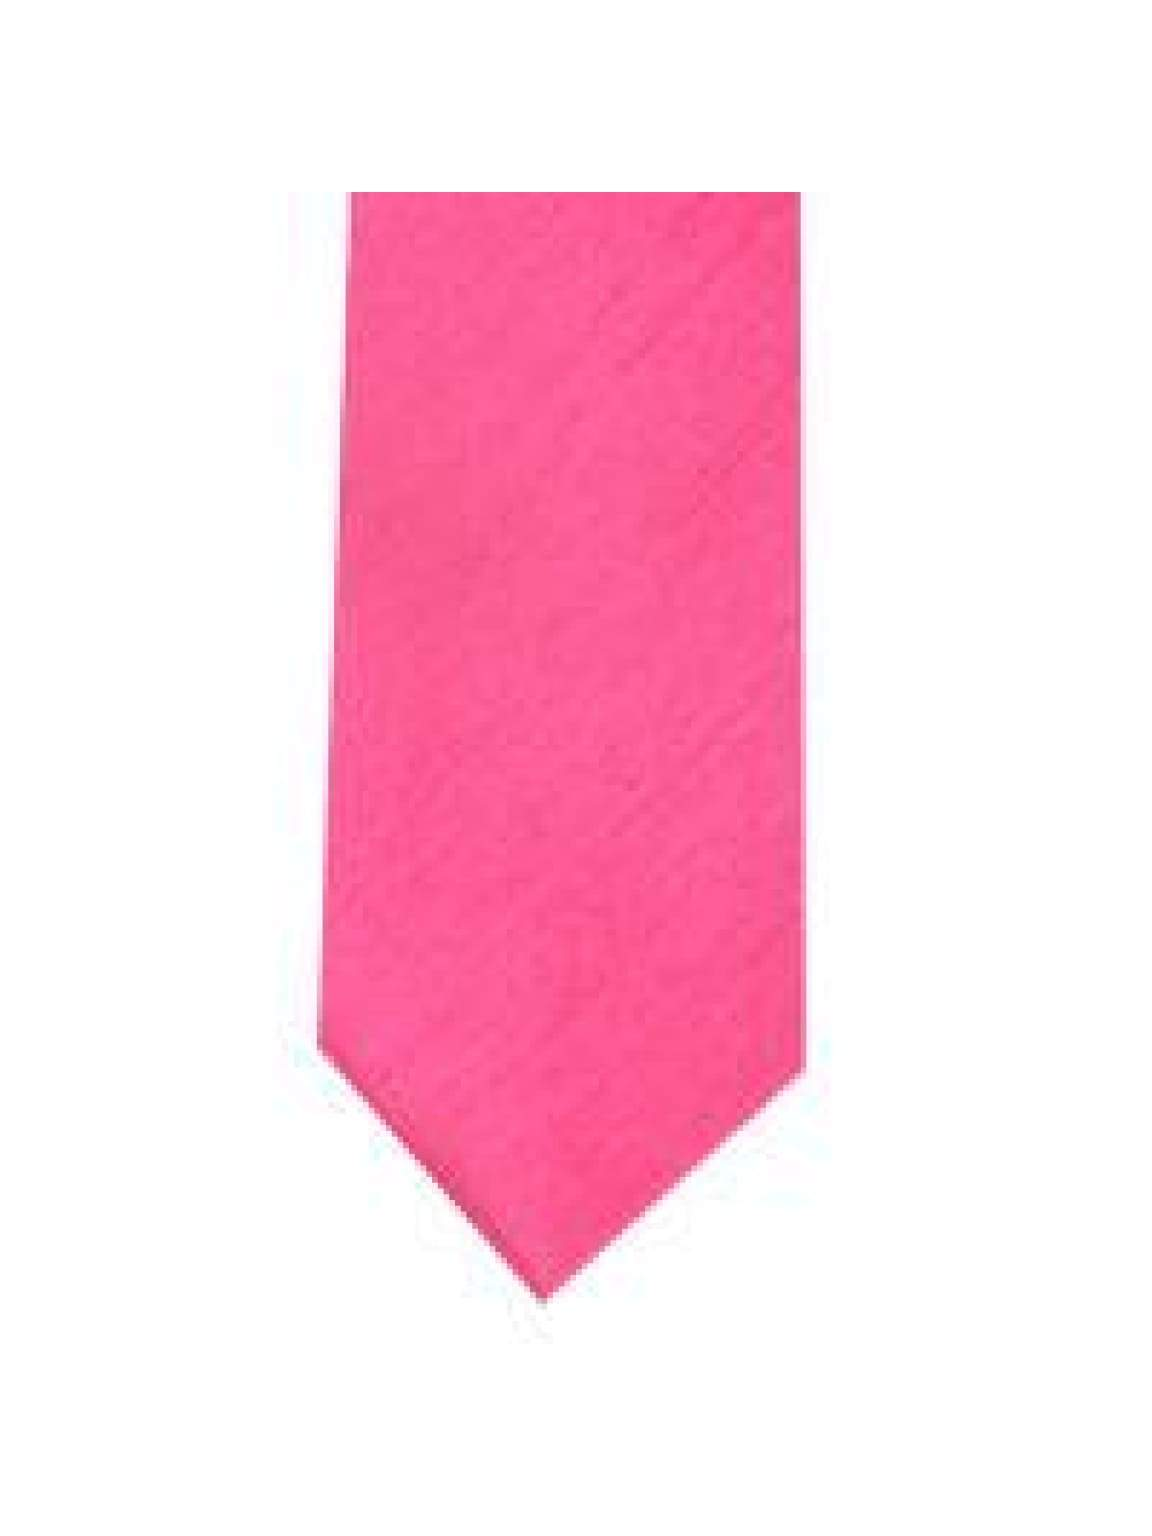 LA Smith Fuchsia Skinny Shantung Tie - Accessories